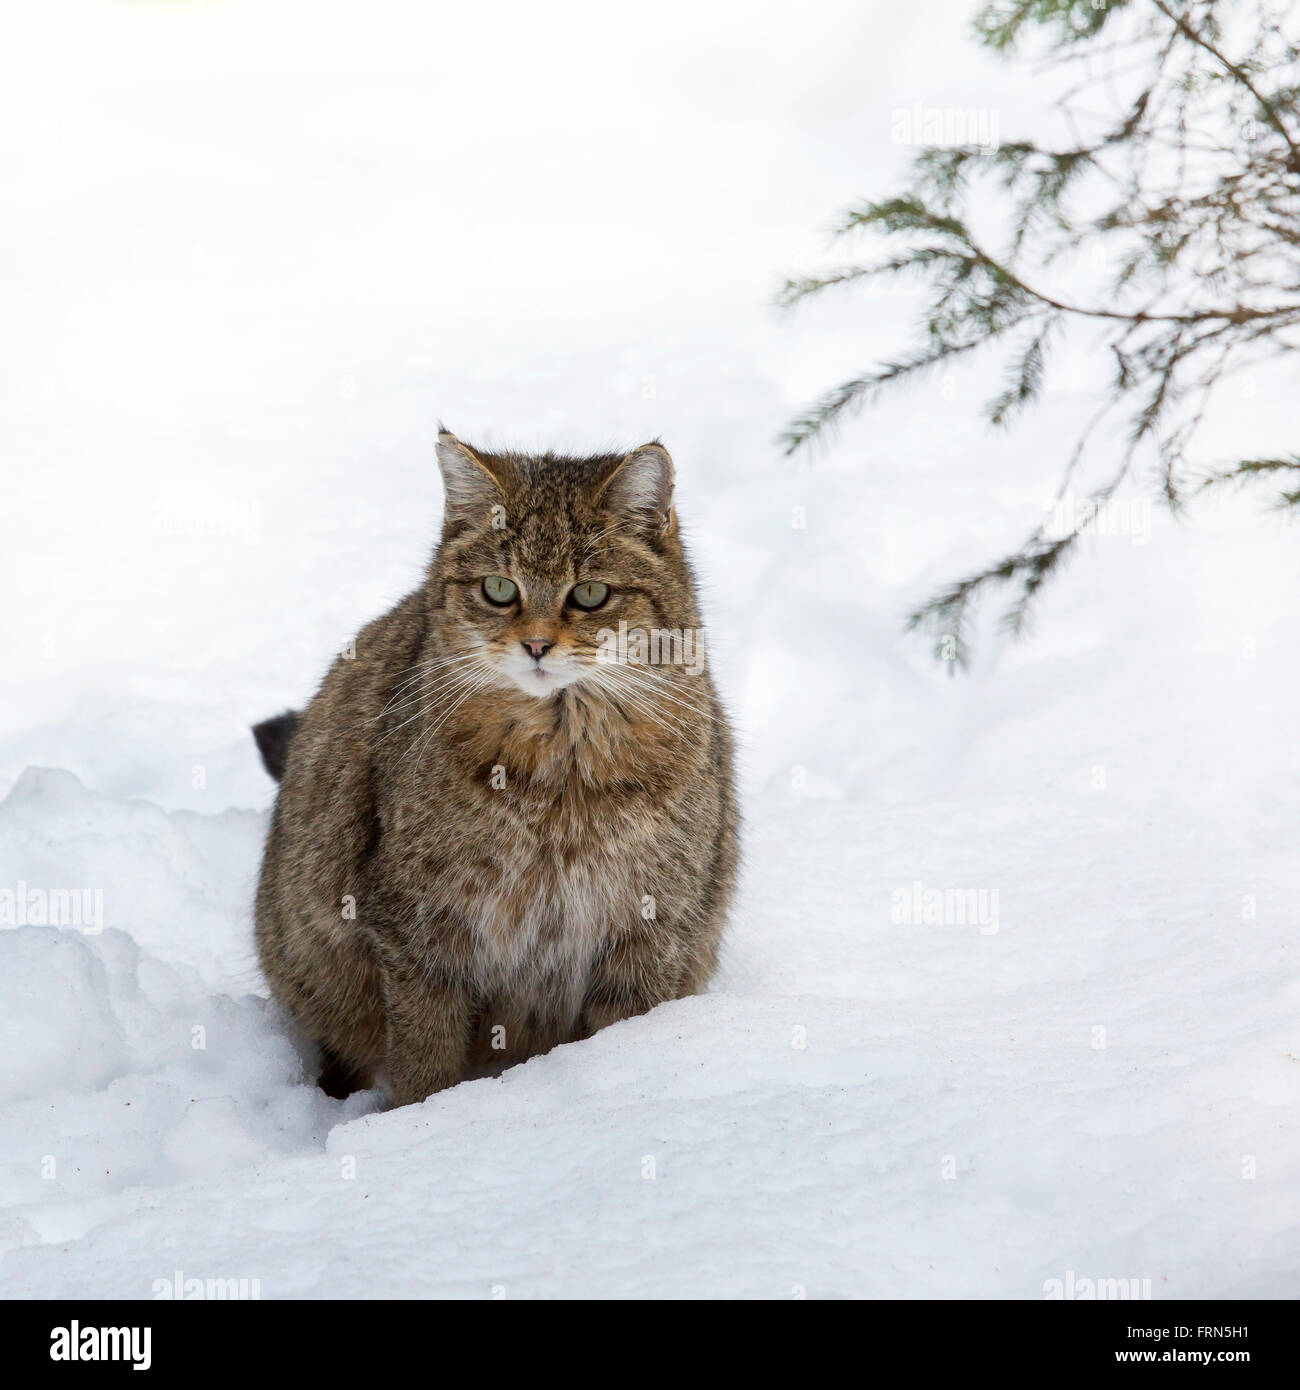 European wild cat (Felis silvestris silvestris) sitting in the snow in winter Stock Photo